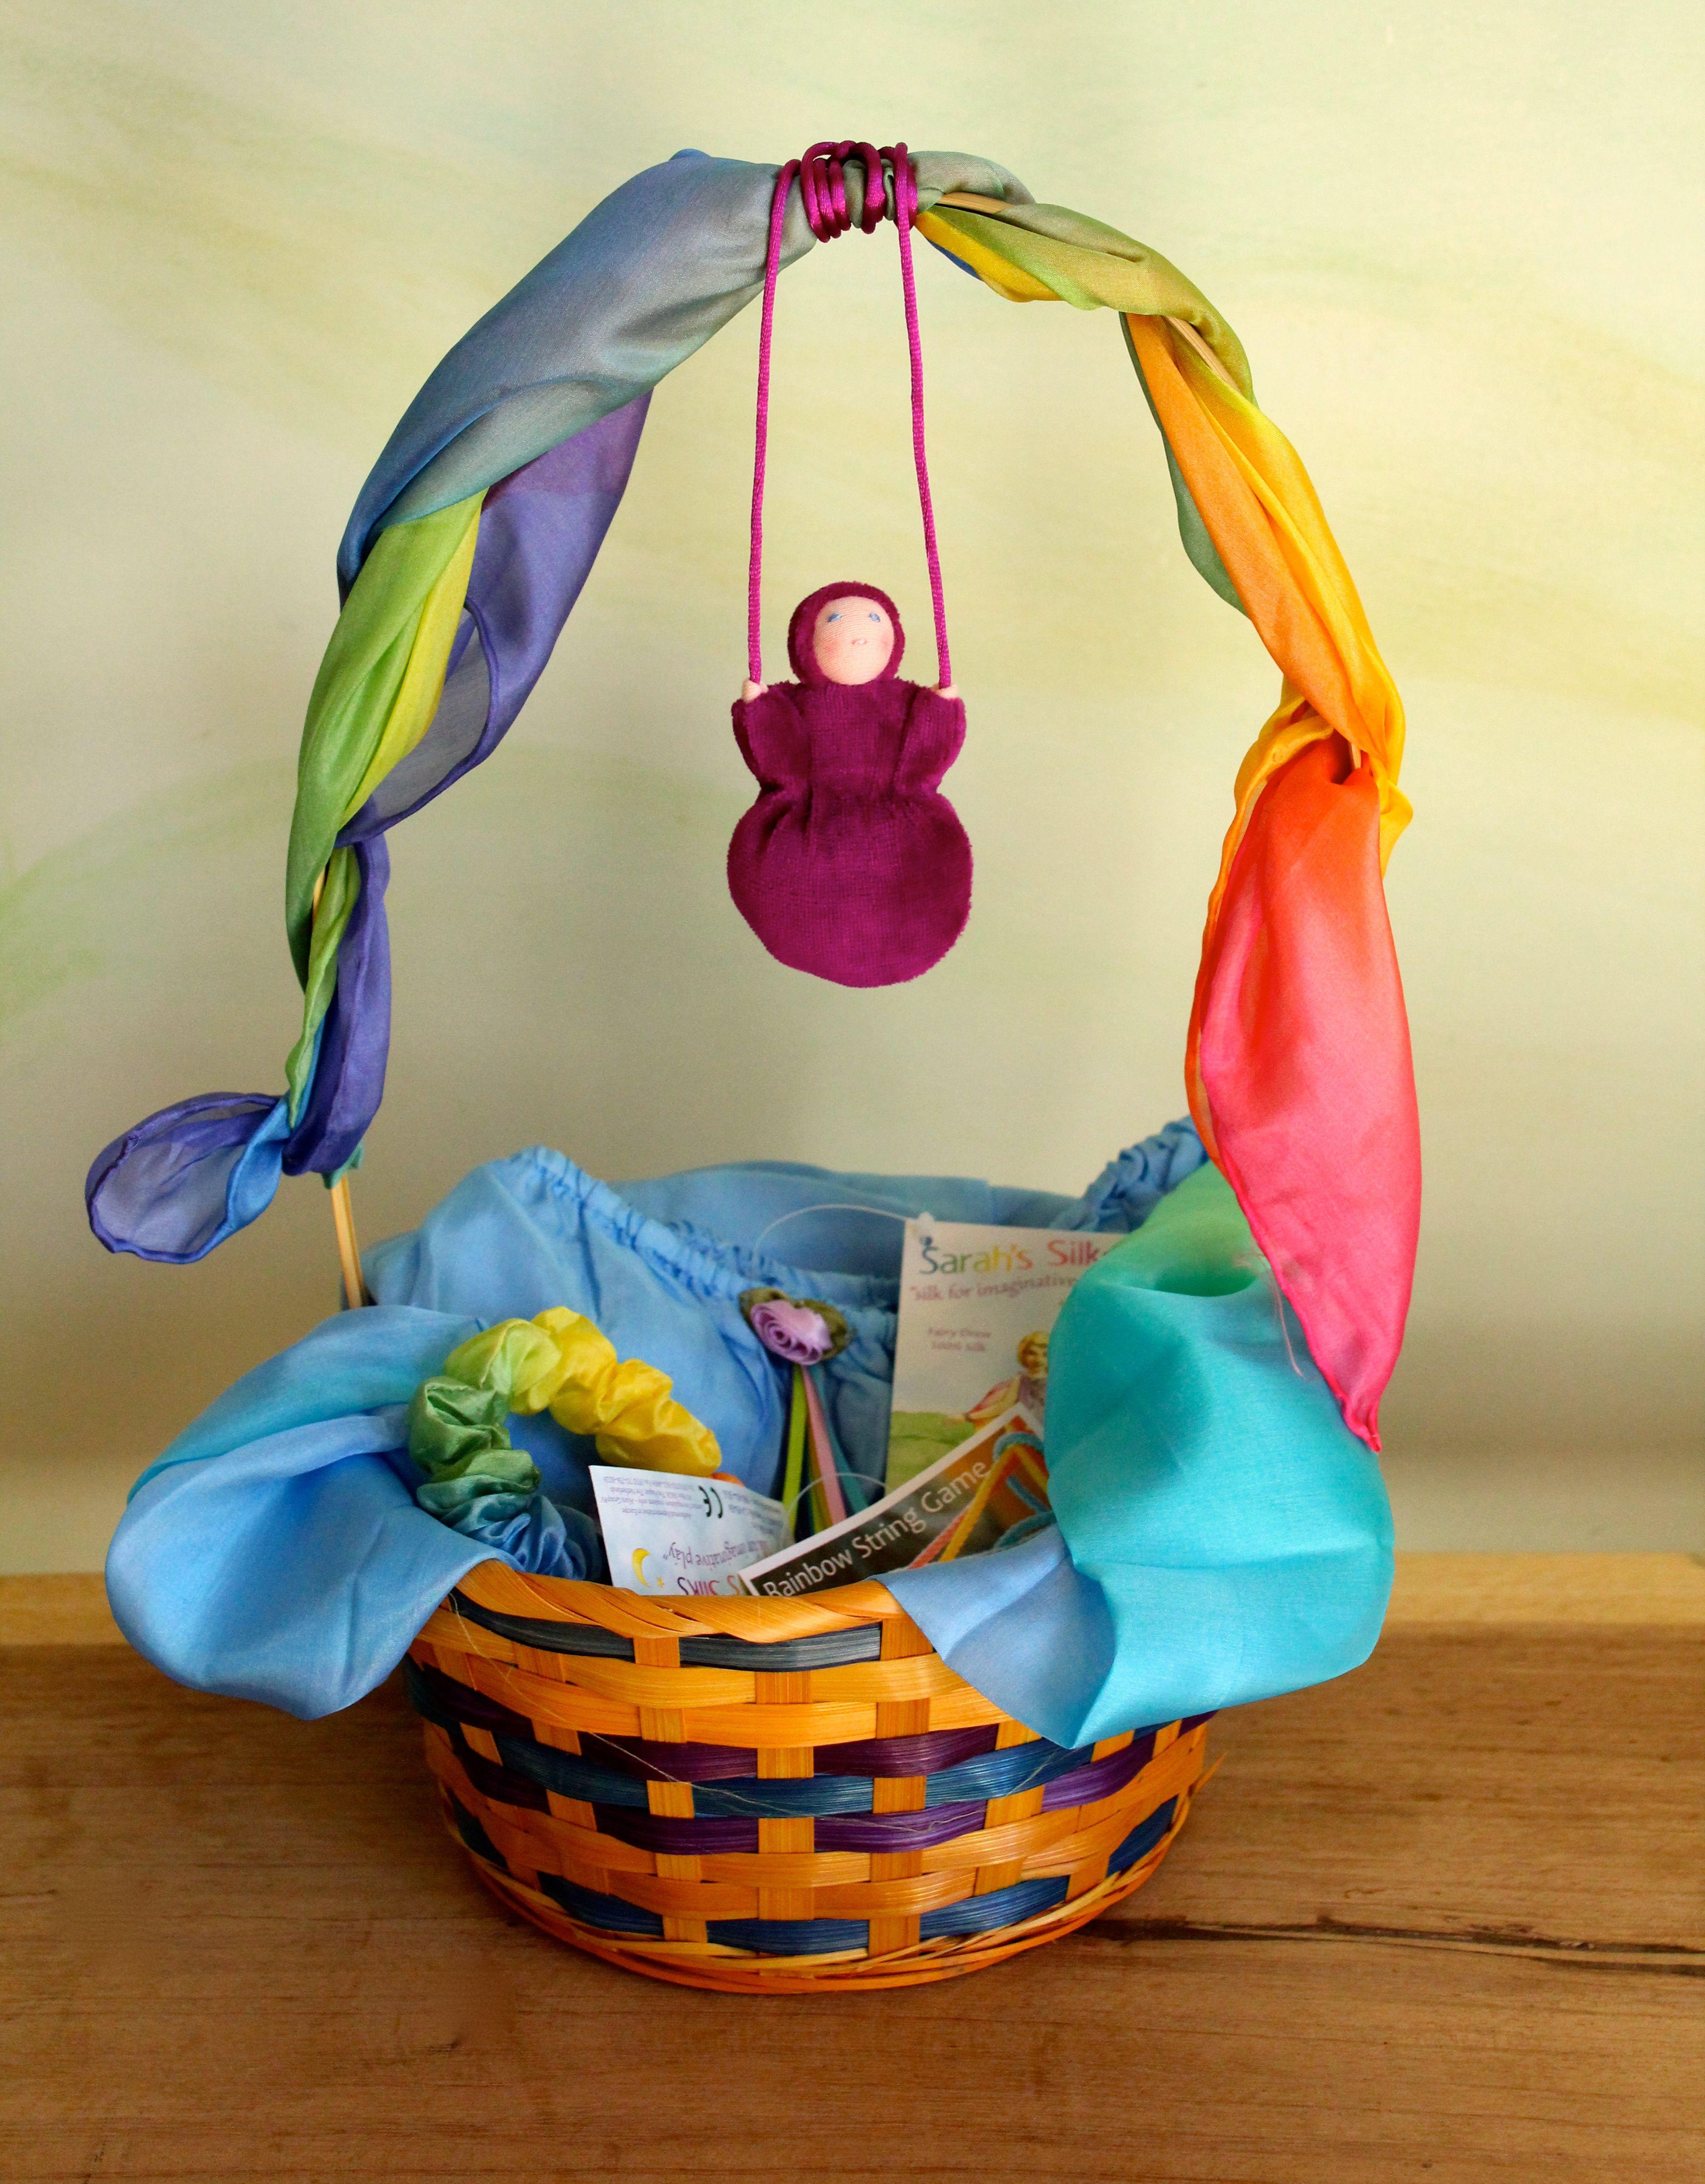 Sarah's Silks Waldorf Easter basket | Easter | Pinterest | Easter ...